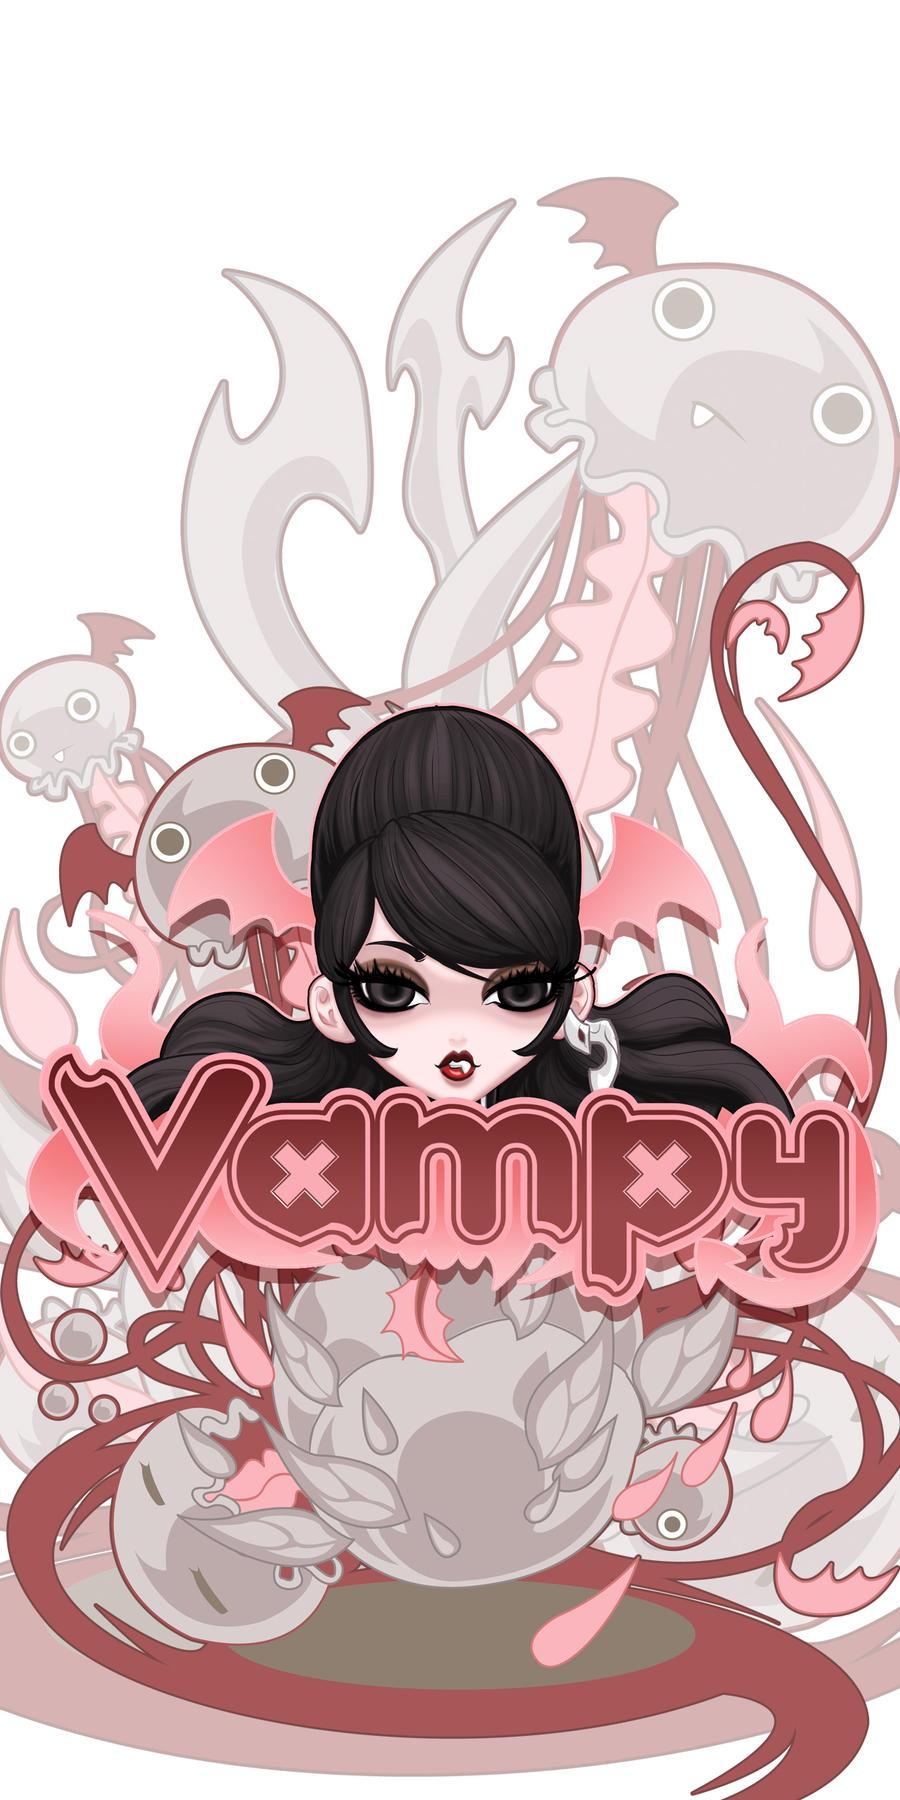 Vampy Love JellyFish by VampBeauty